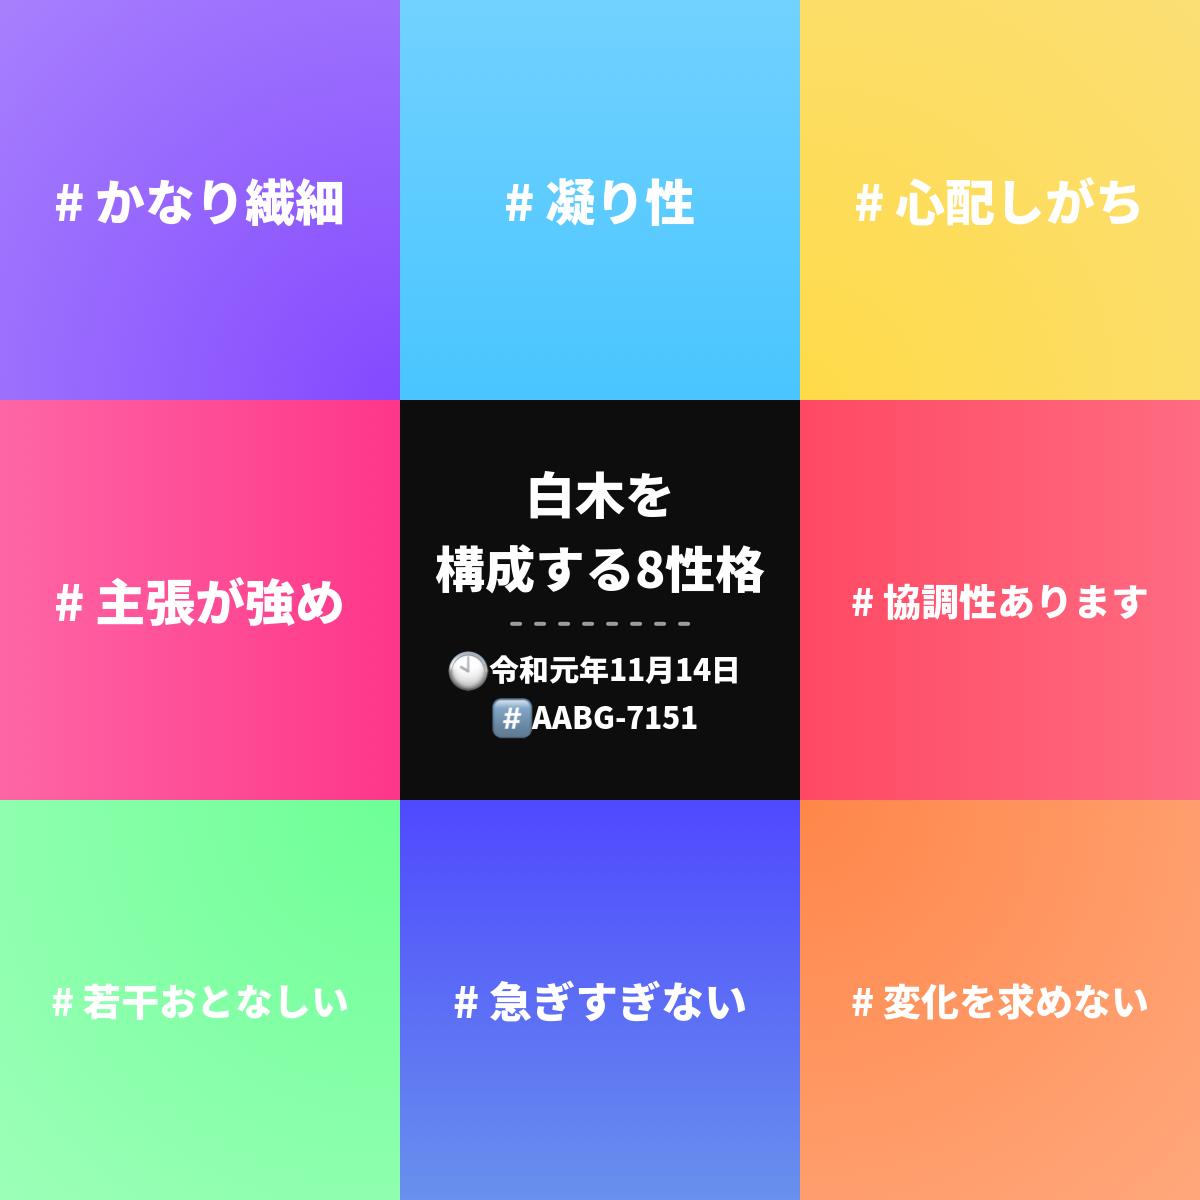 f:id:shirakihanae:20191222211413p:plain